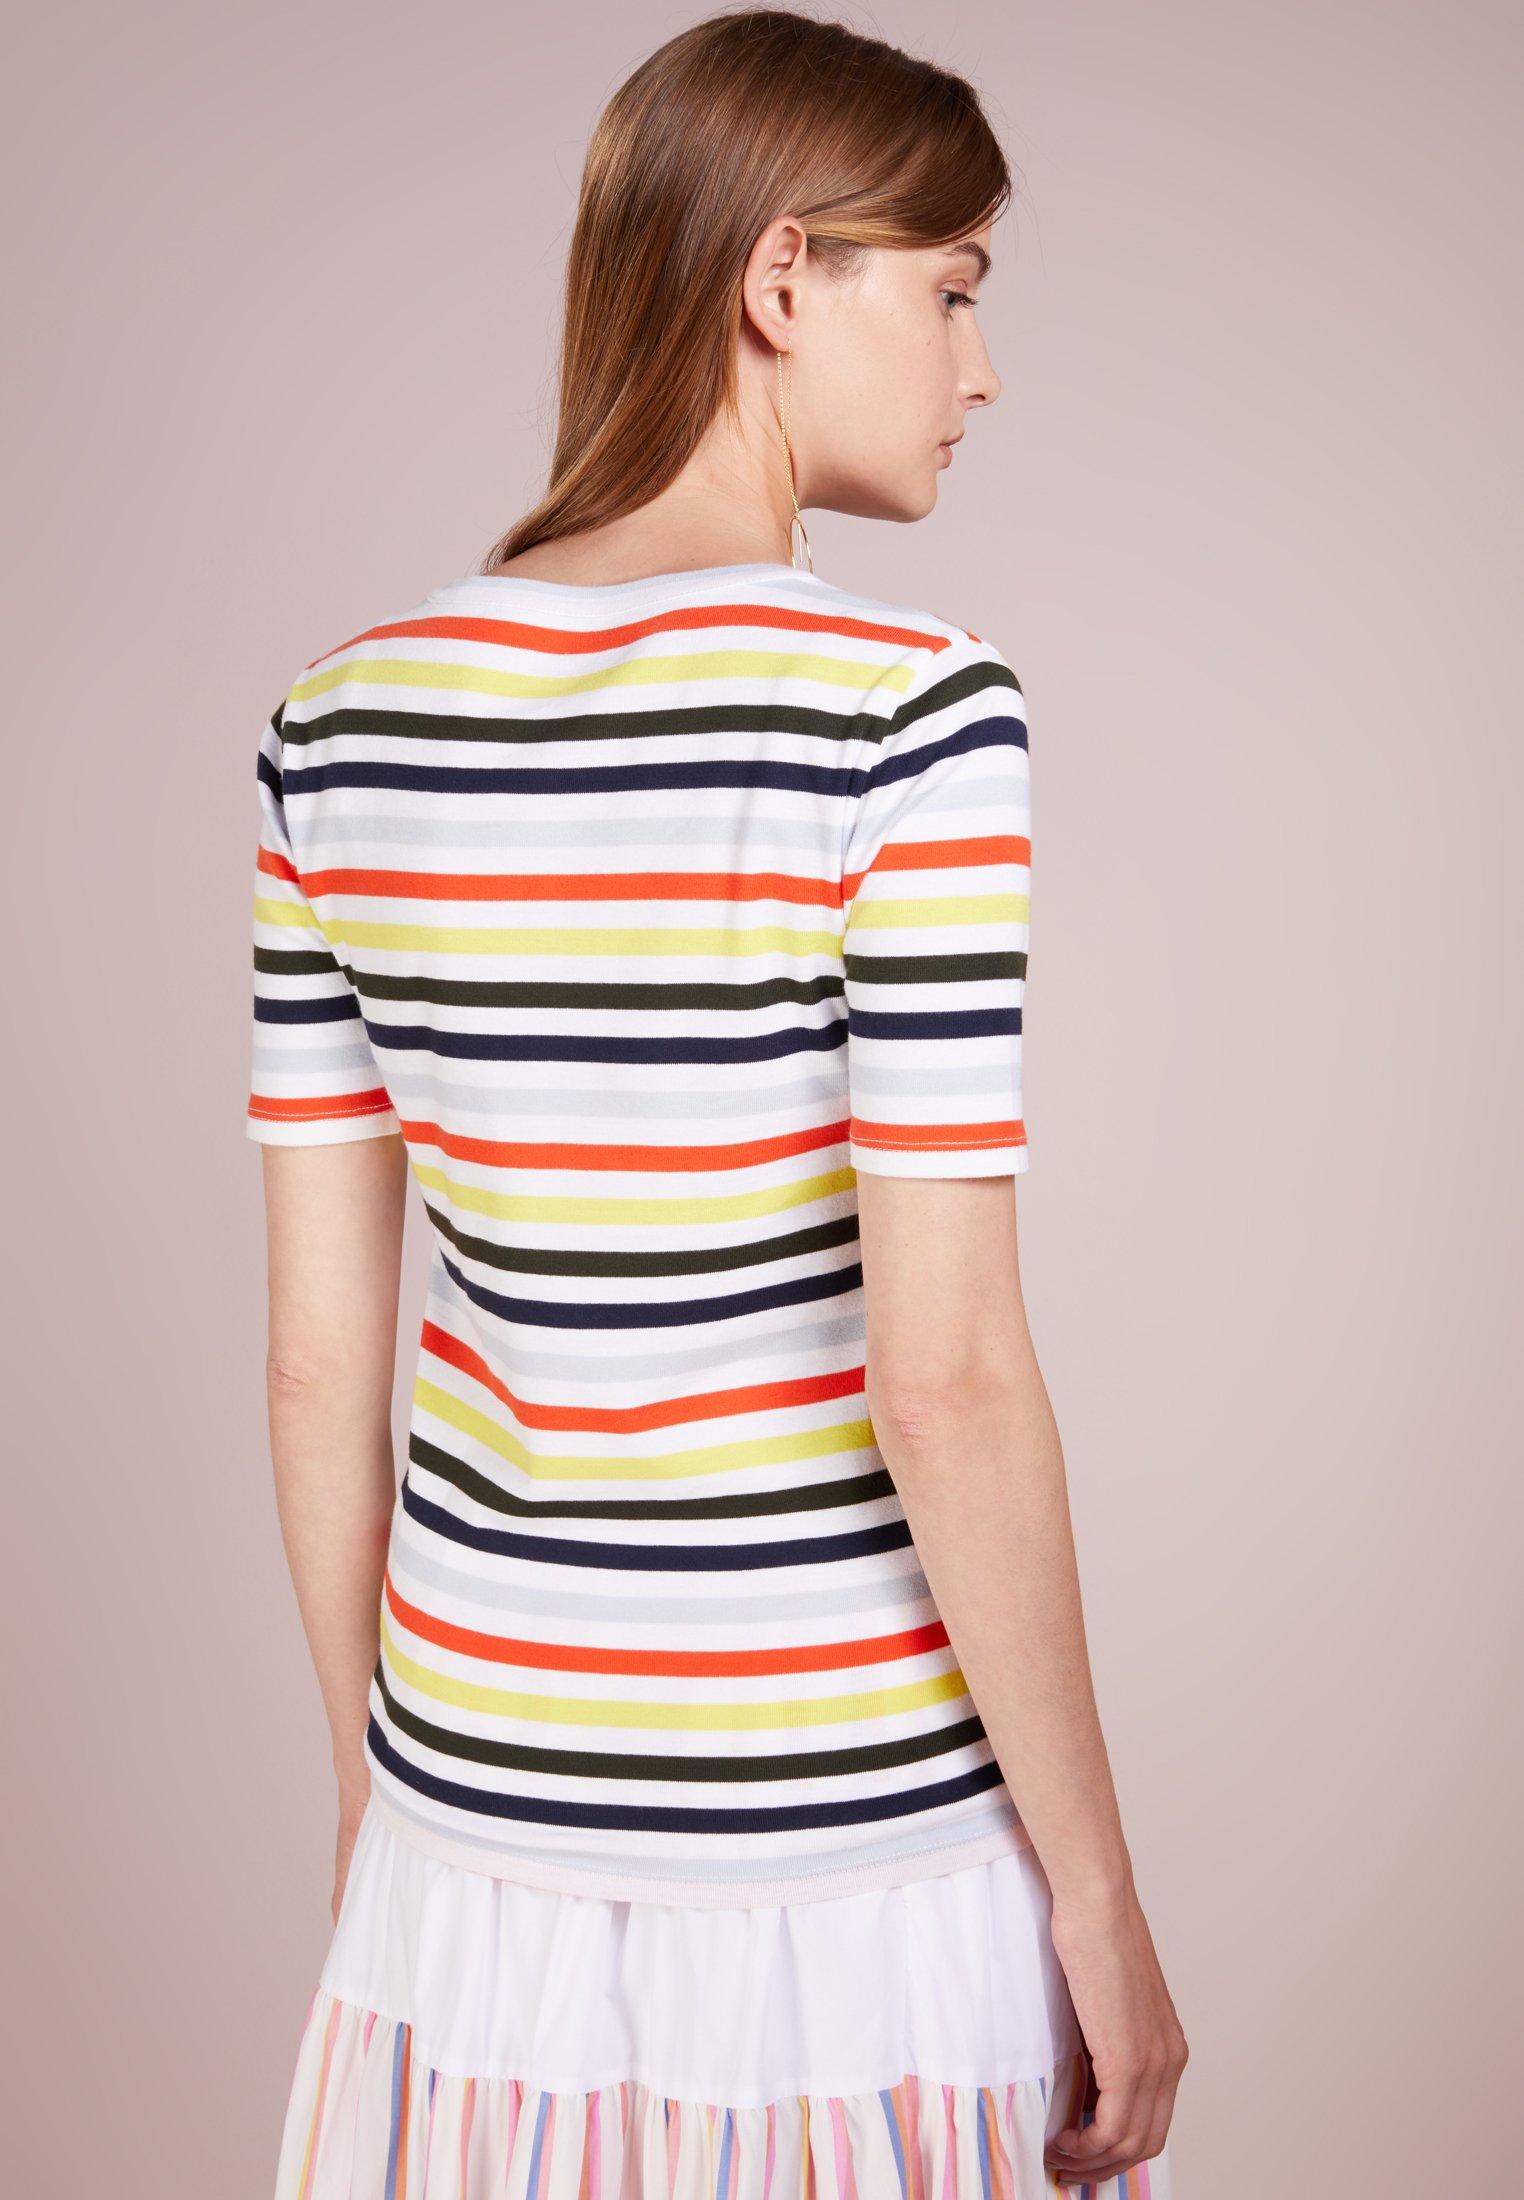 crew Fit shirt Tee Multi StripeT Imprimé White J Perfect HIeYWDbE29